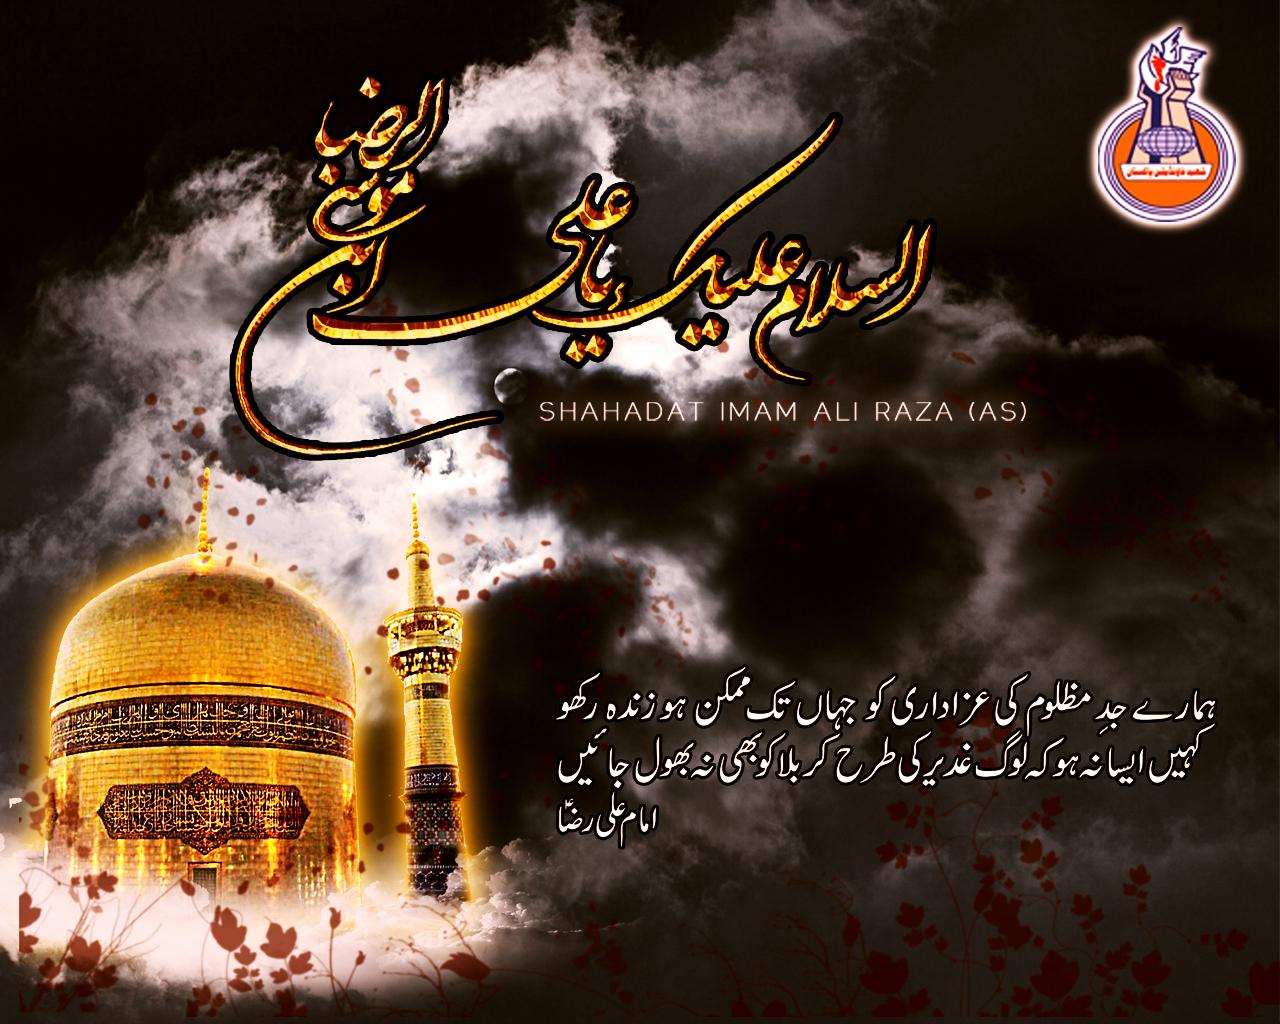 Shahdat Imam Raza